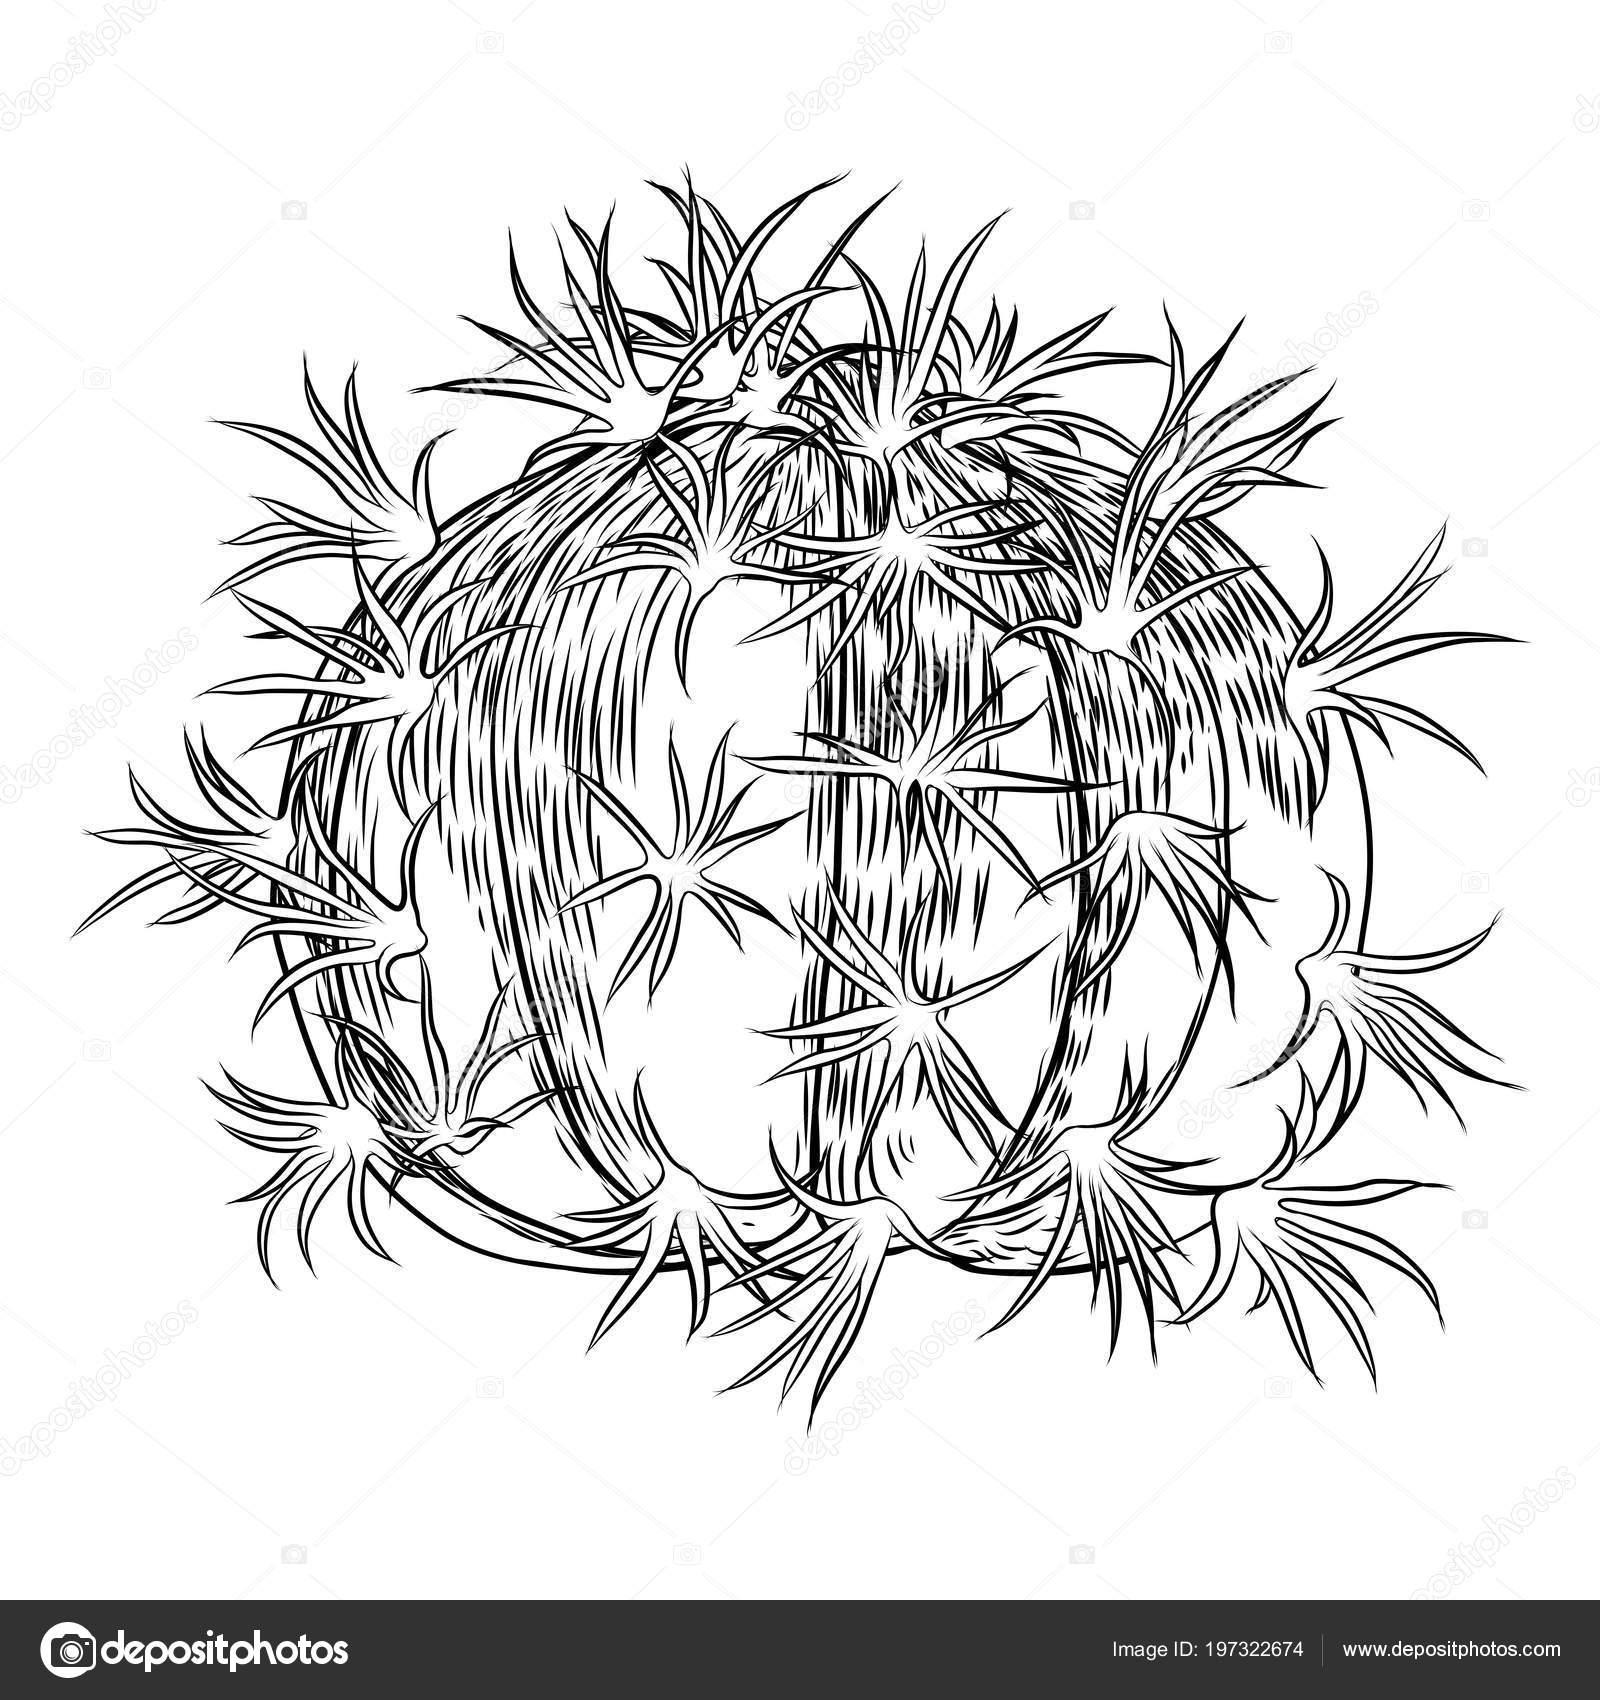 Drawings Cute Cactus Cute Cactus Illustration Handmade Hand Drawn Outline Cacti Succulent Drawing Stock Vector C Goldenshrimp 197322674